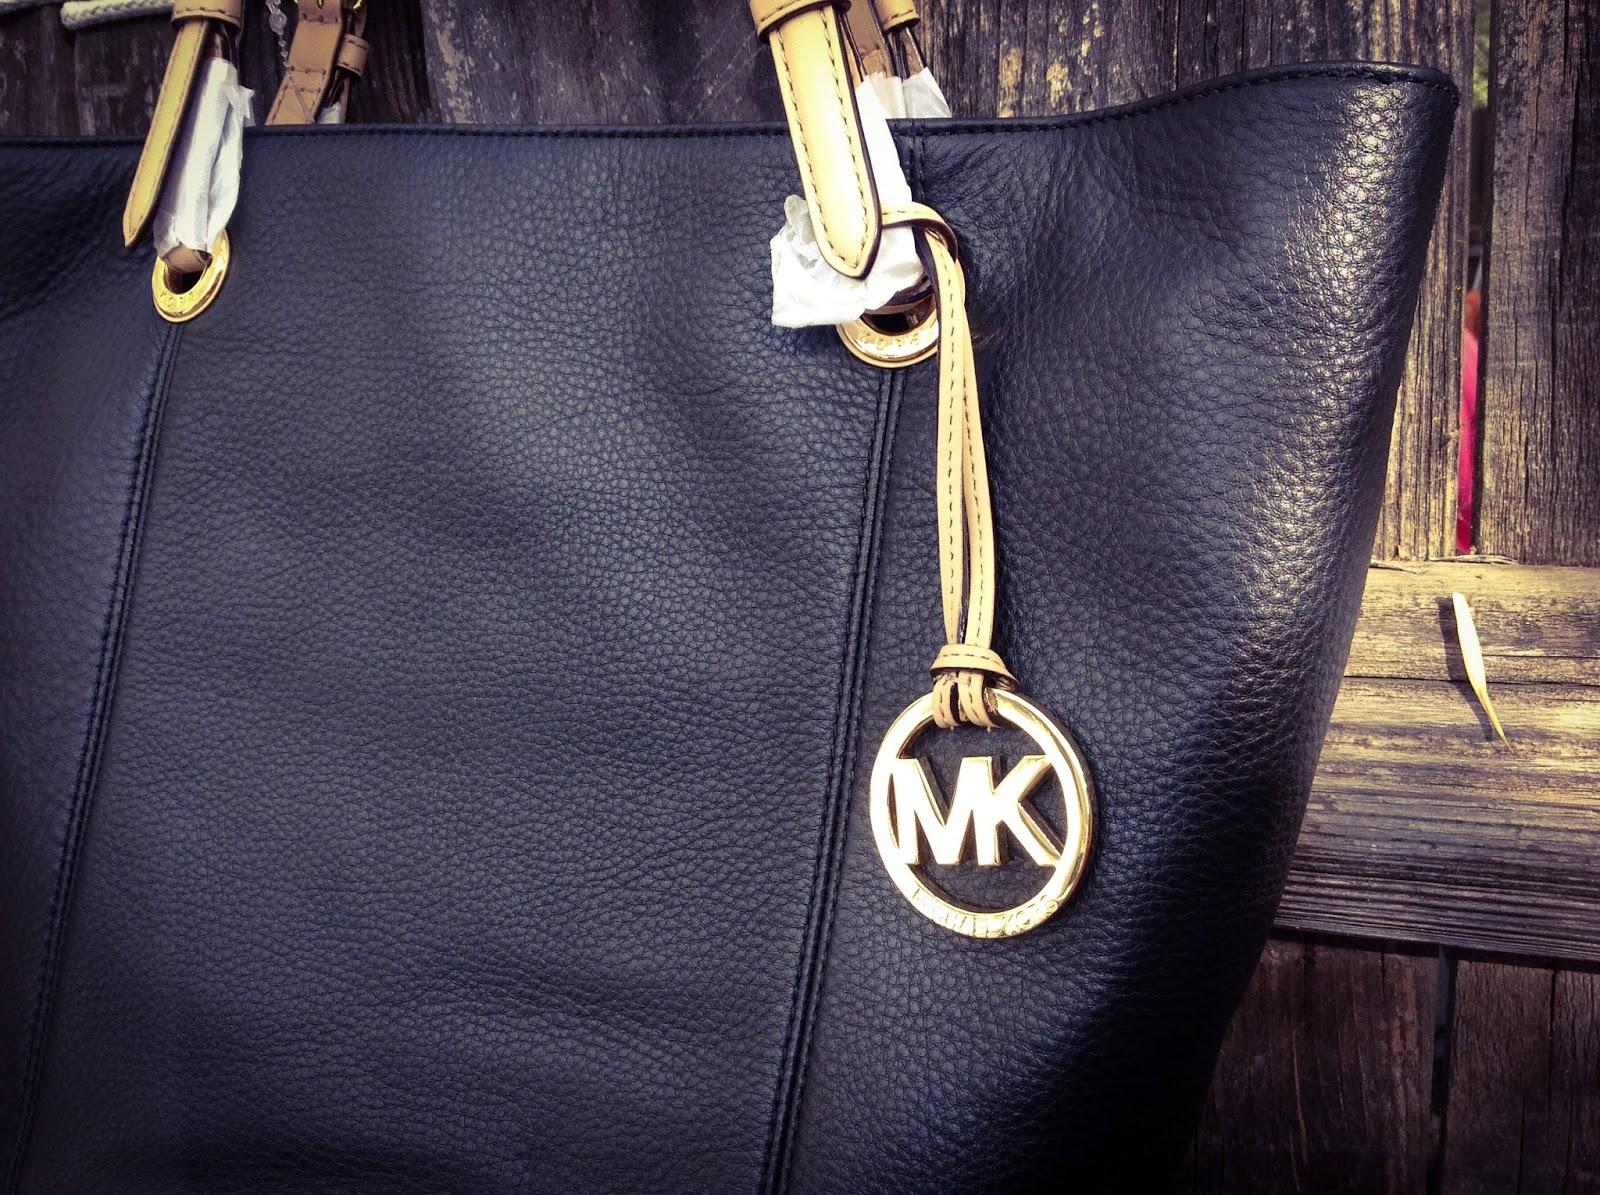 mk bag tk maxx mkclearance. Black Bedroom Furniture Sets. Home Design Ideas